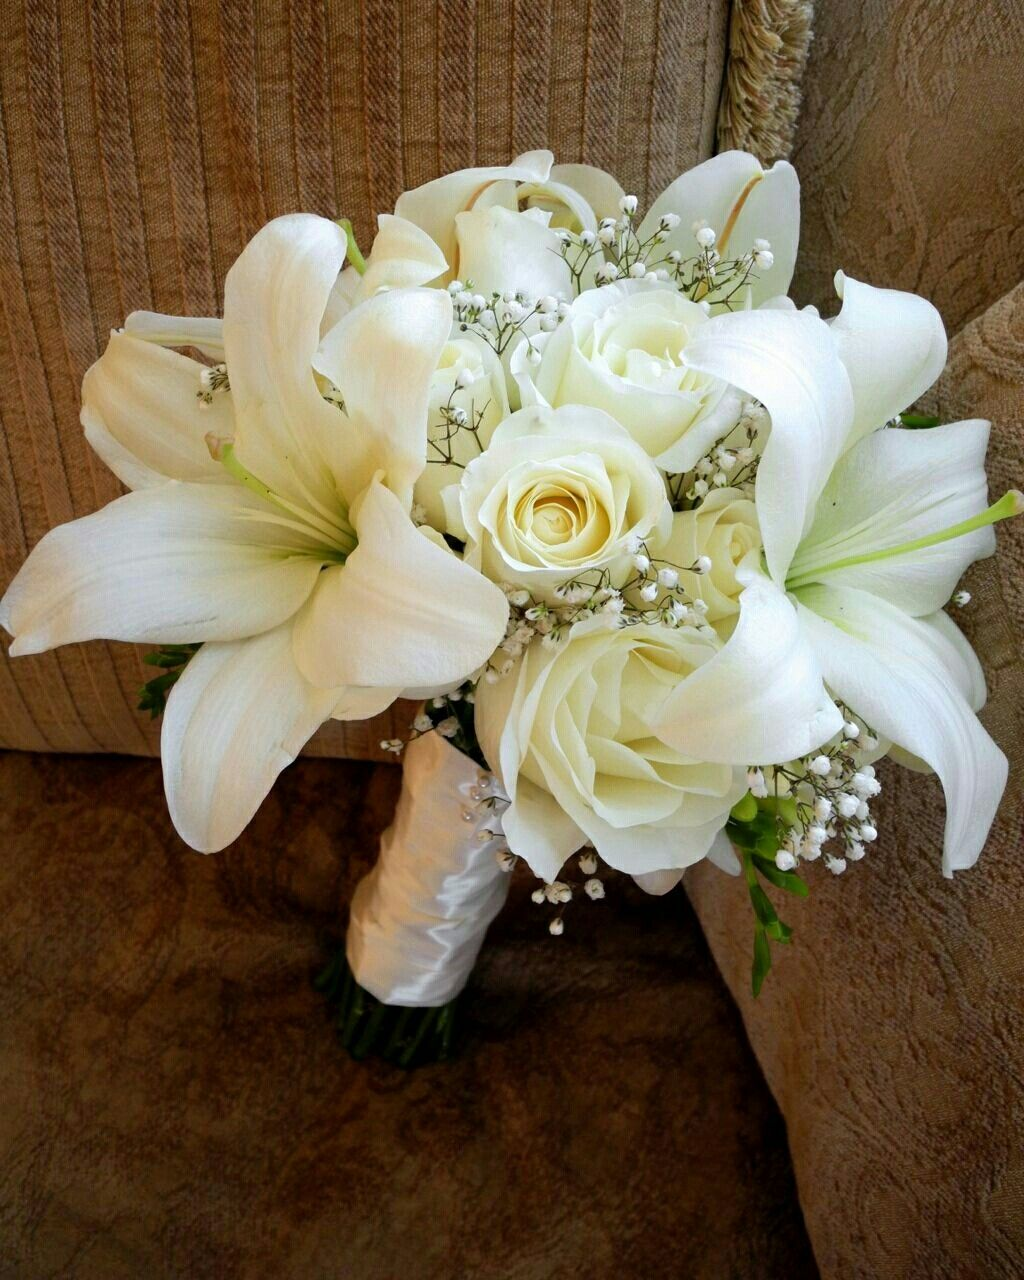 White Casablanca Lilies White Roses White Freesia White Gypsophila Wedding Bouquet Lily Bouquet Wedding Bridal Bouquet Flowers Purple Wedding Bouquets